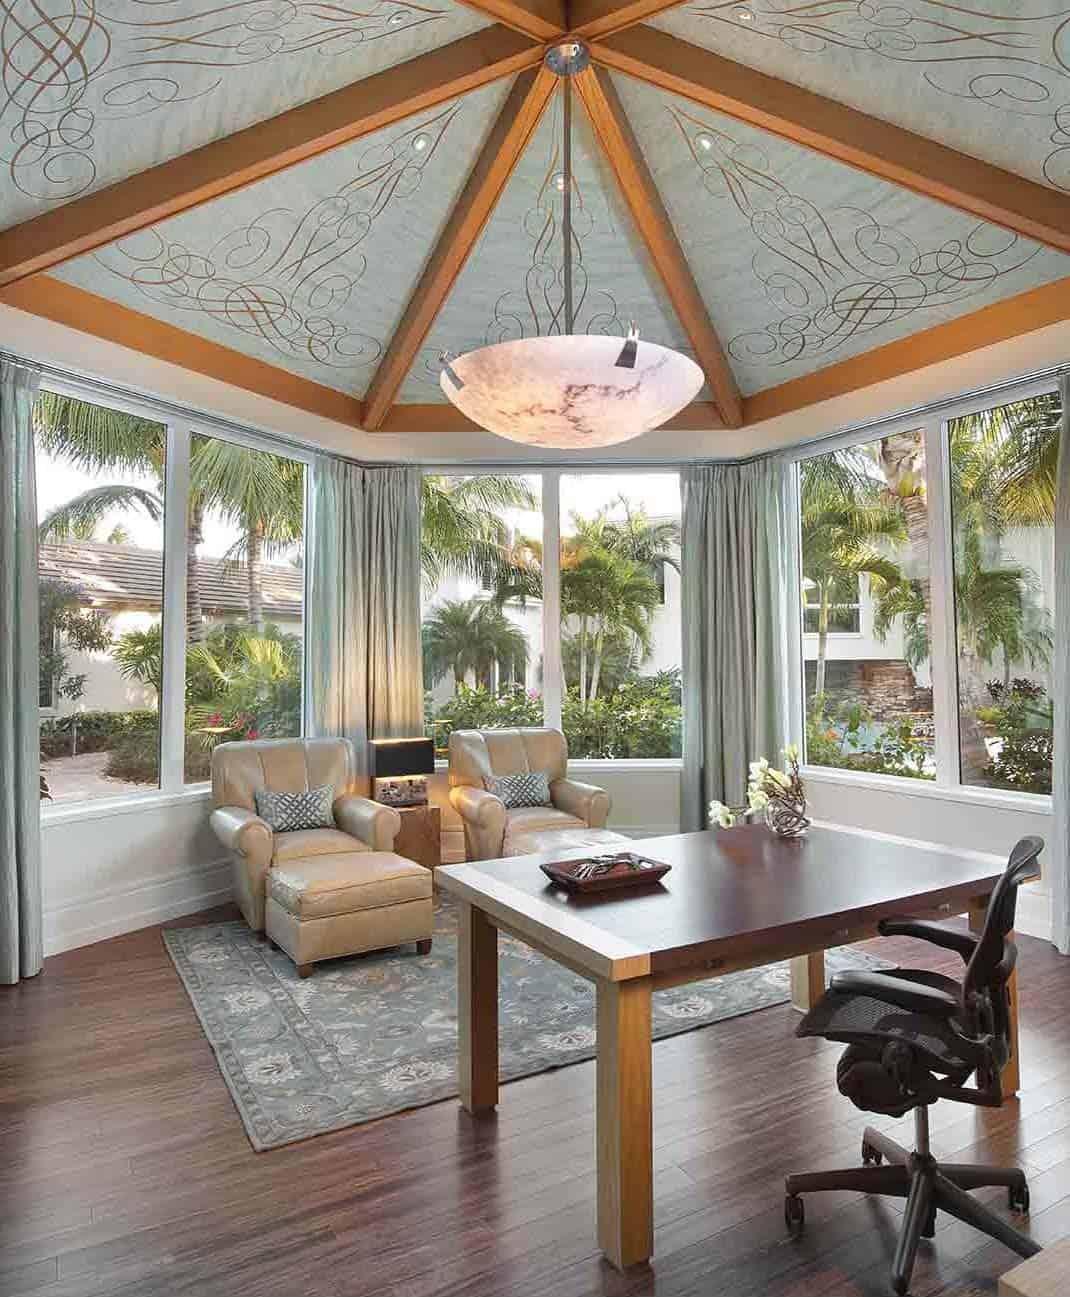 maison-de-plage-moderne-herscoe-hajjar-architectes-15-1-kindesign